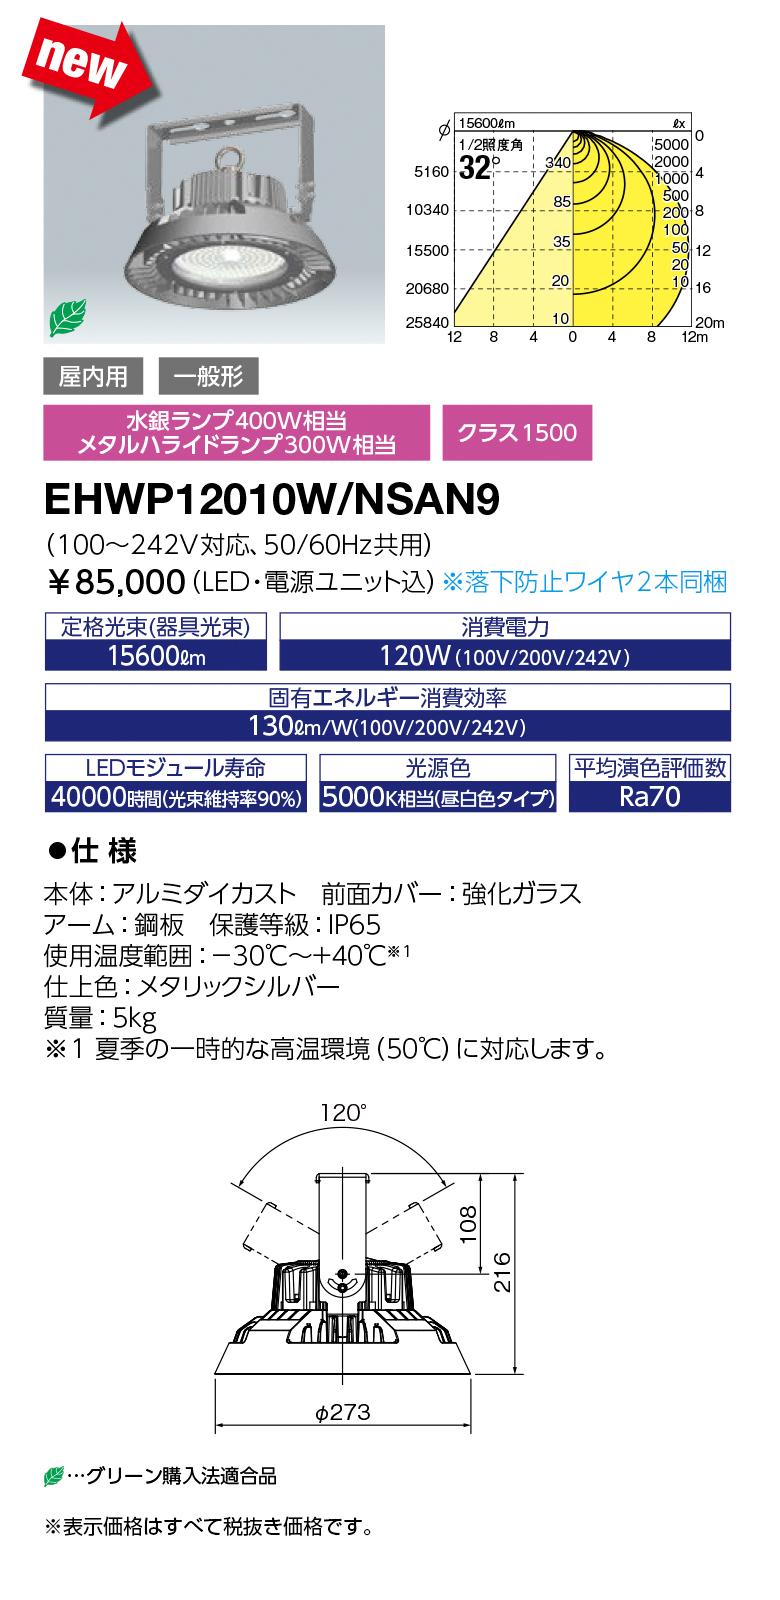 EHWP12010W/NSAN9